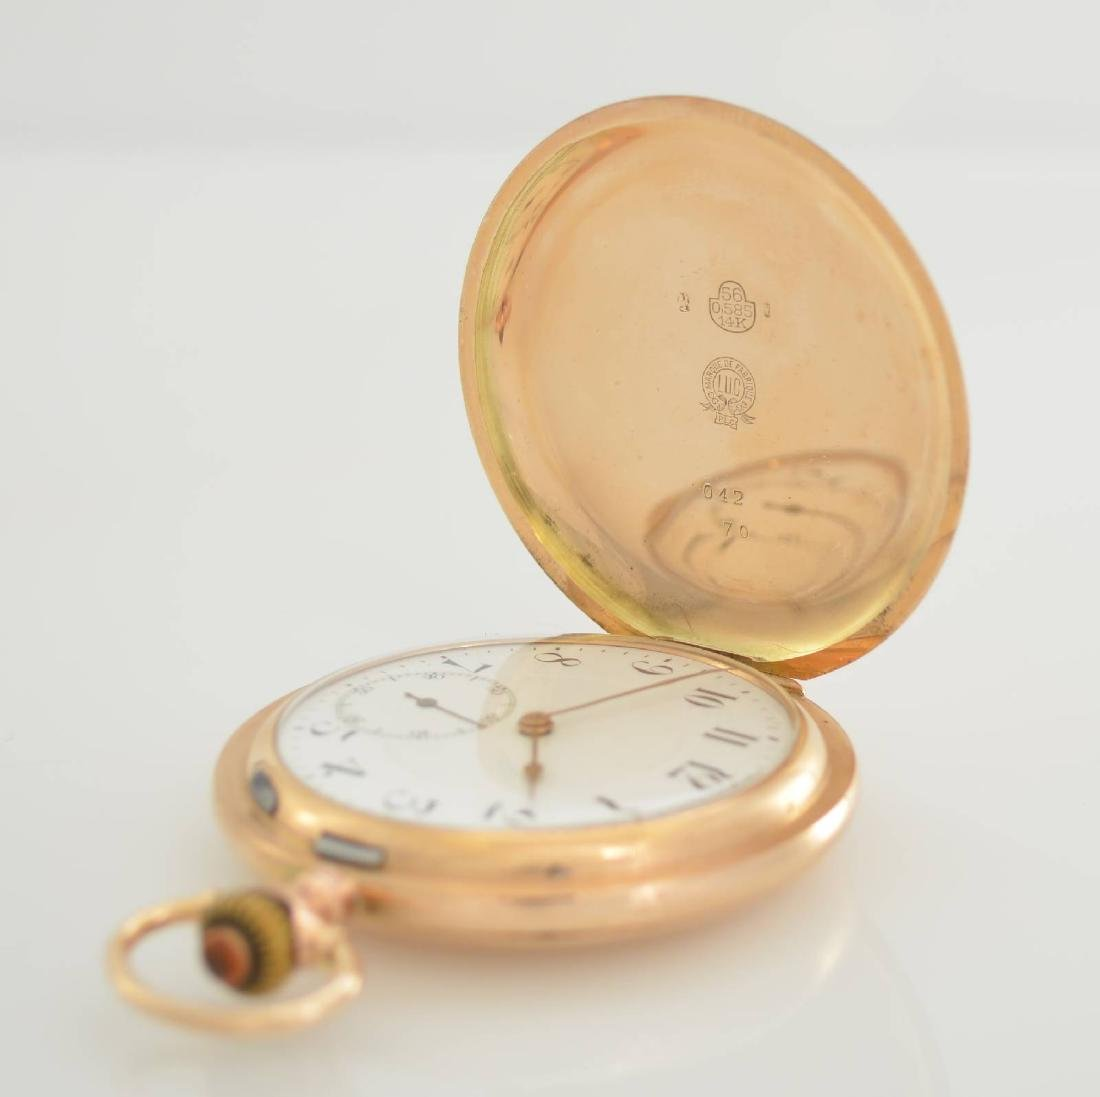 L.U.C. Chopard 14k pink gold pocket watch - 2